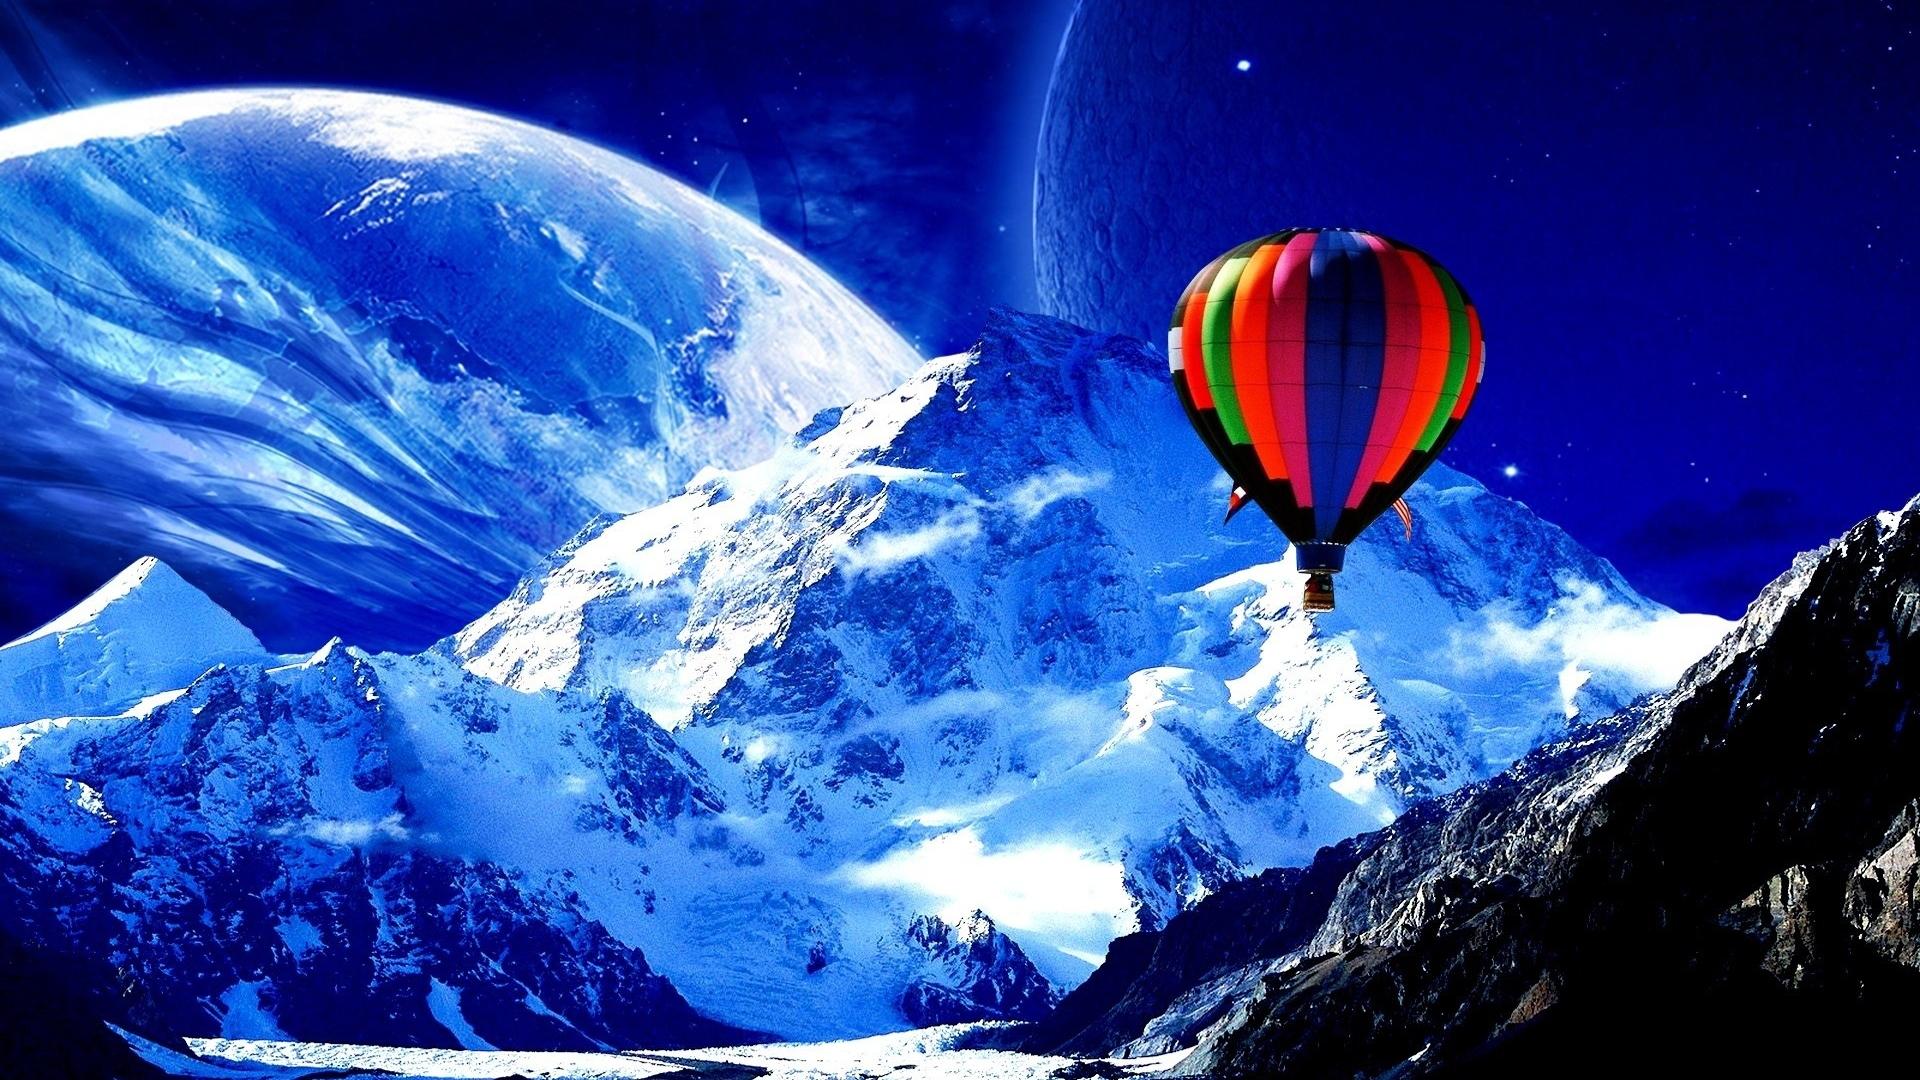 воздушный шар, горы, снег